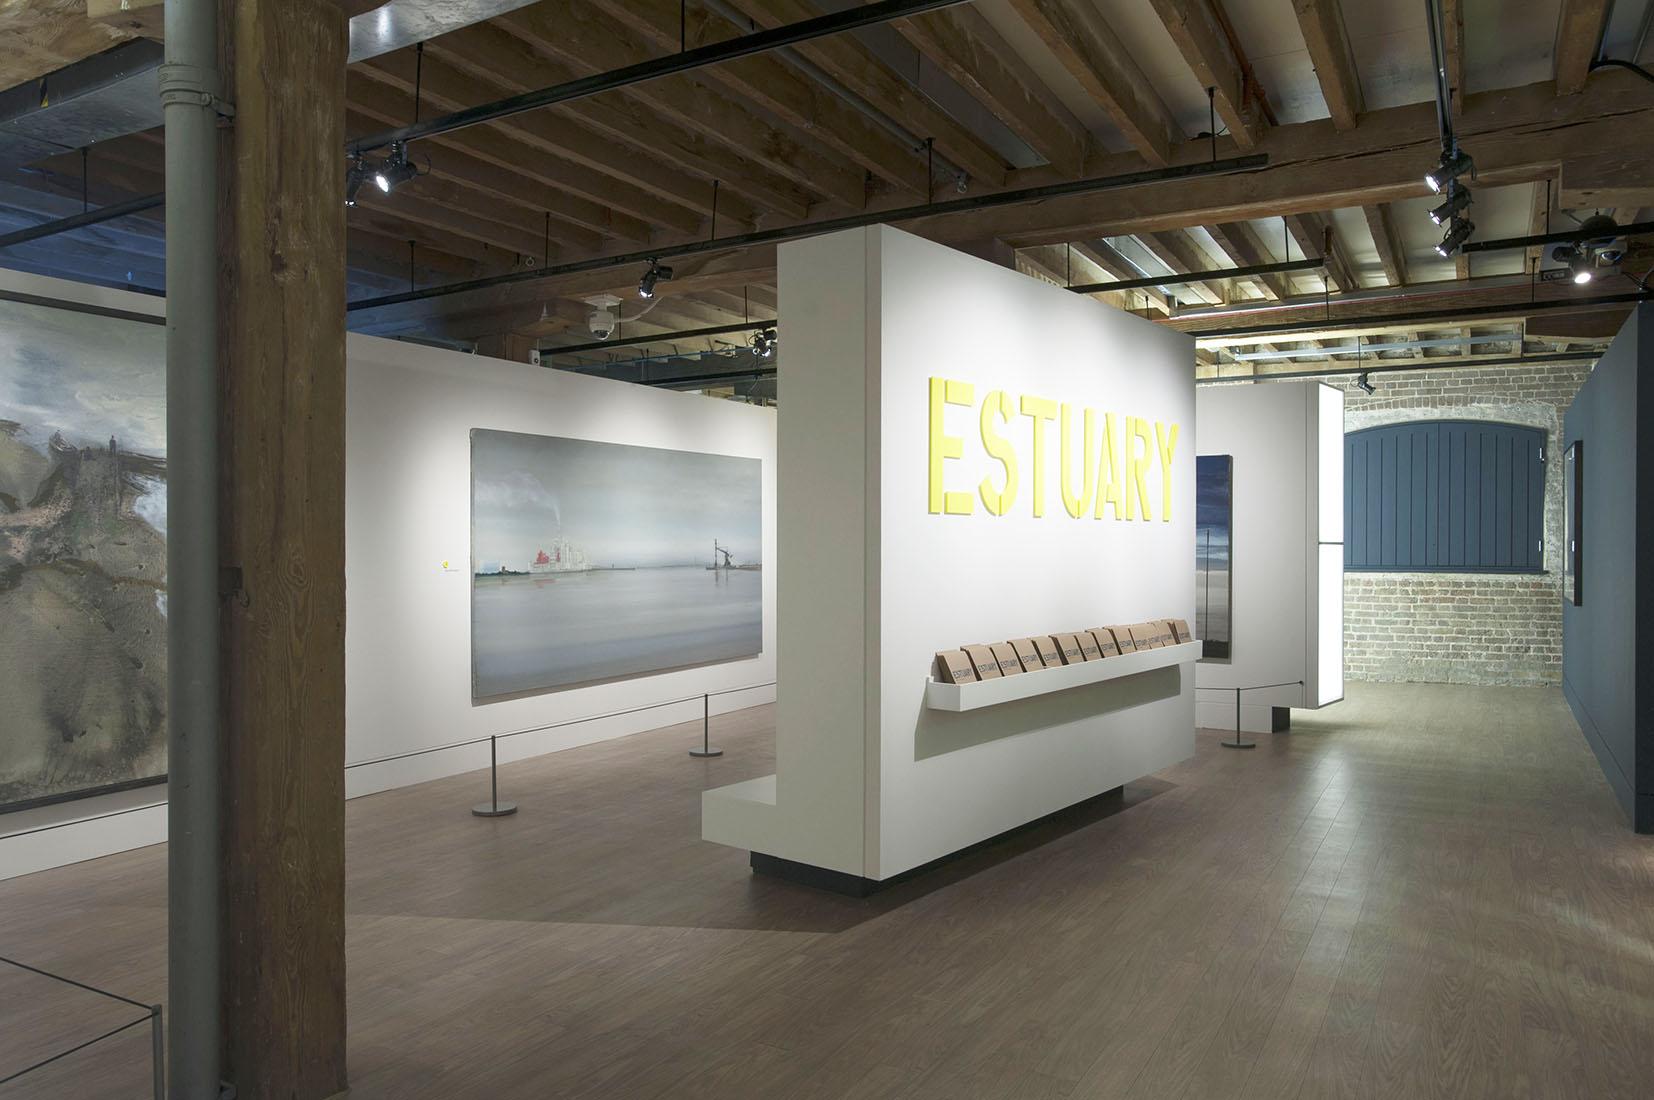 06 estuary exhibition_1.jpg